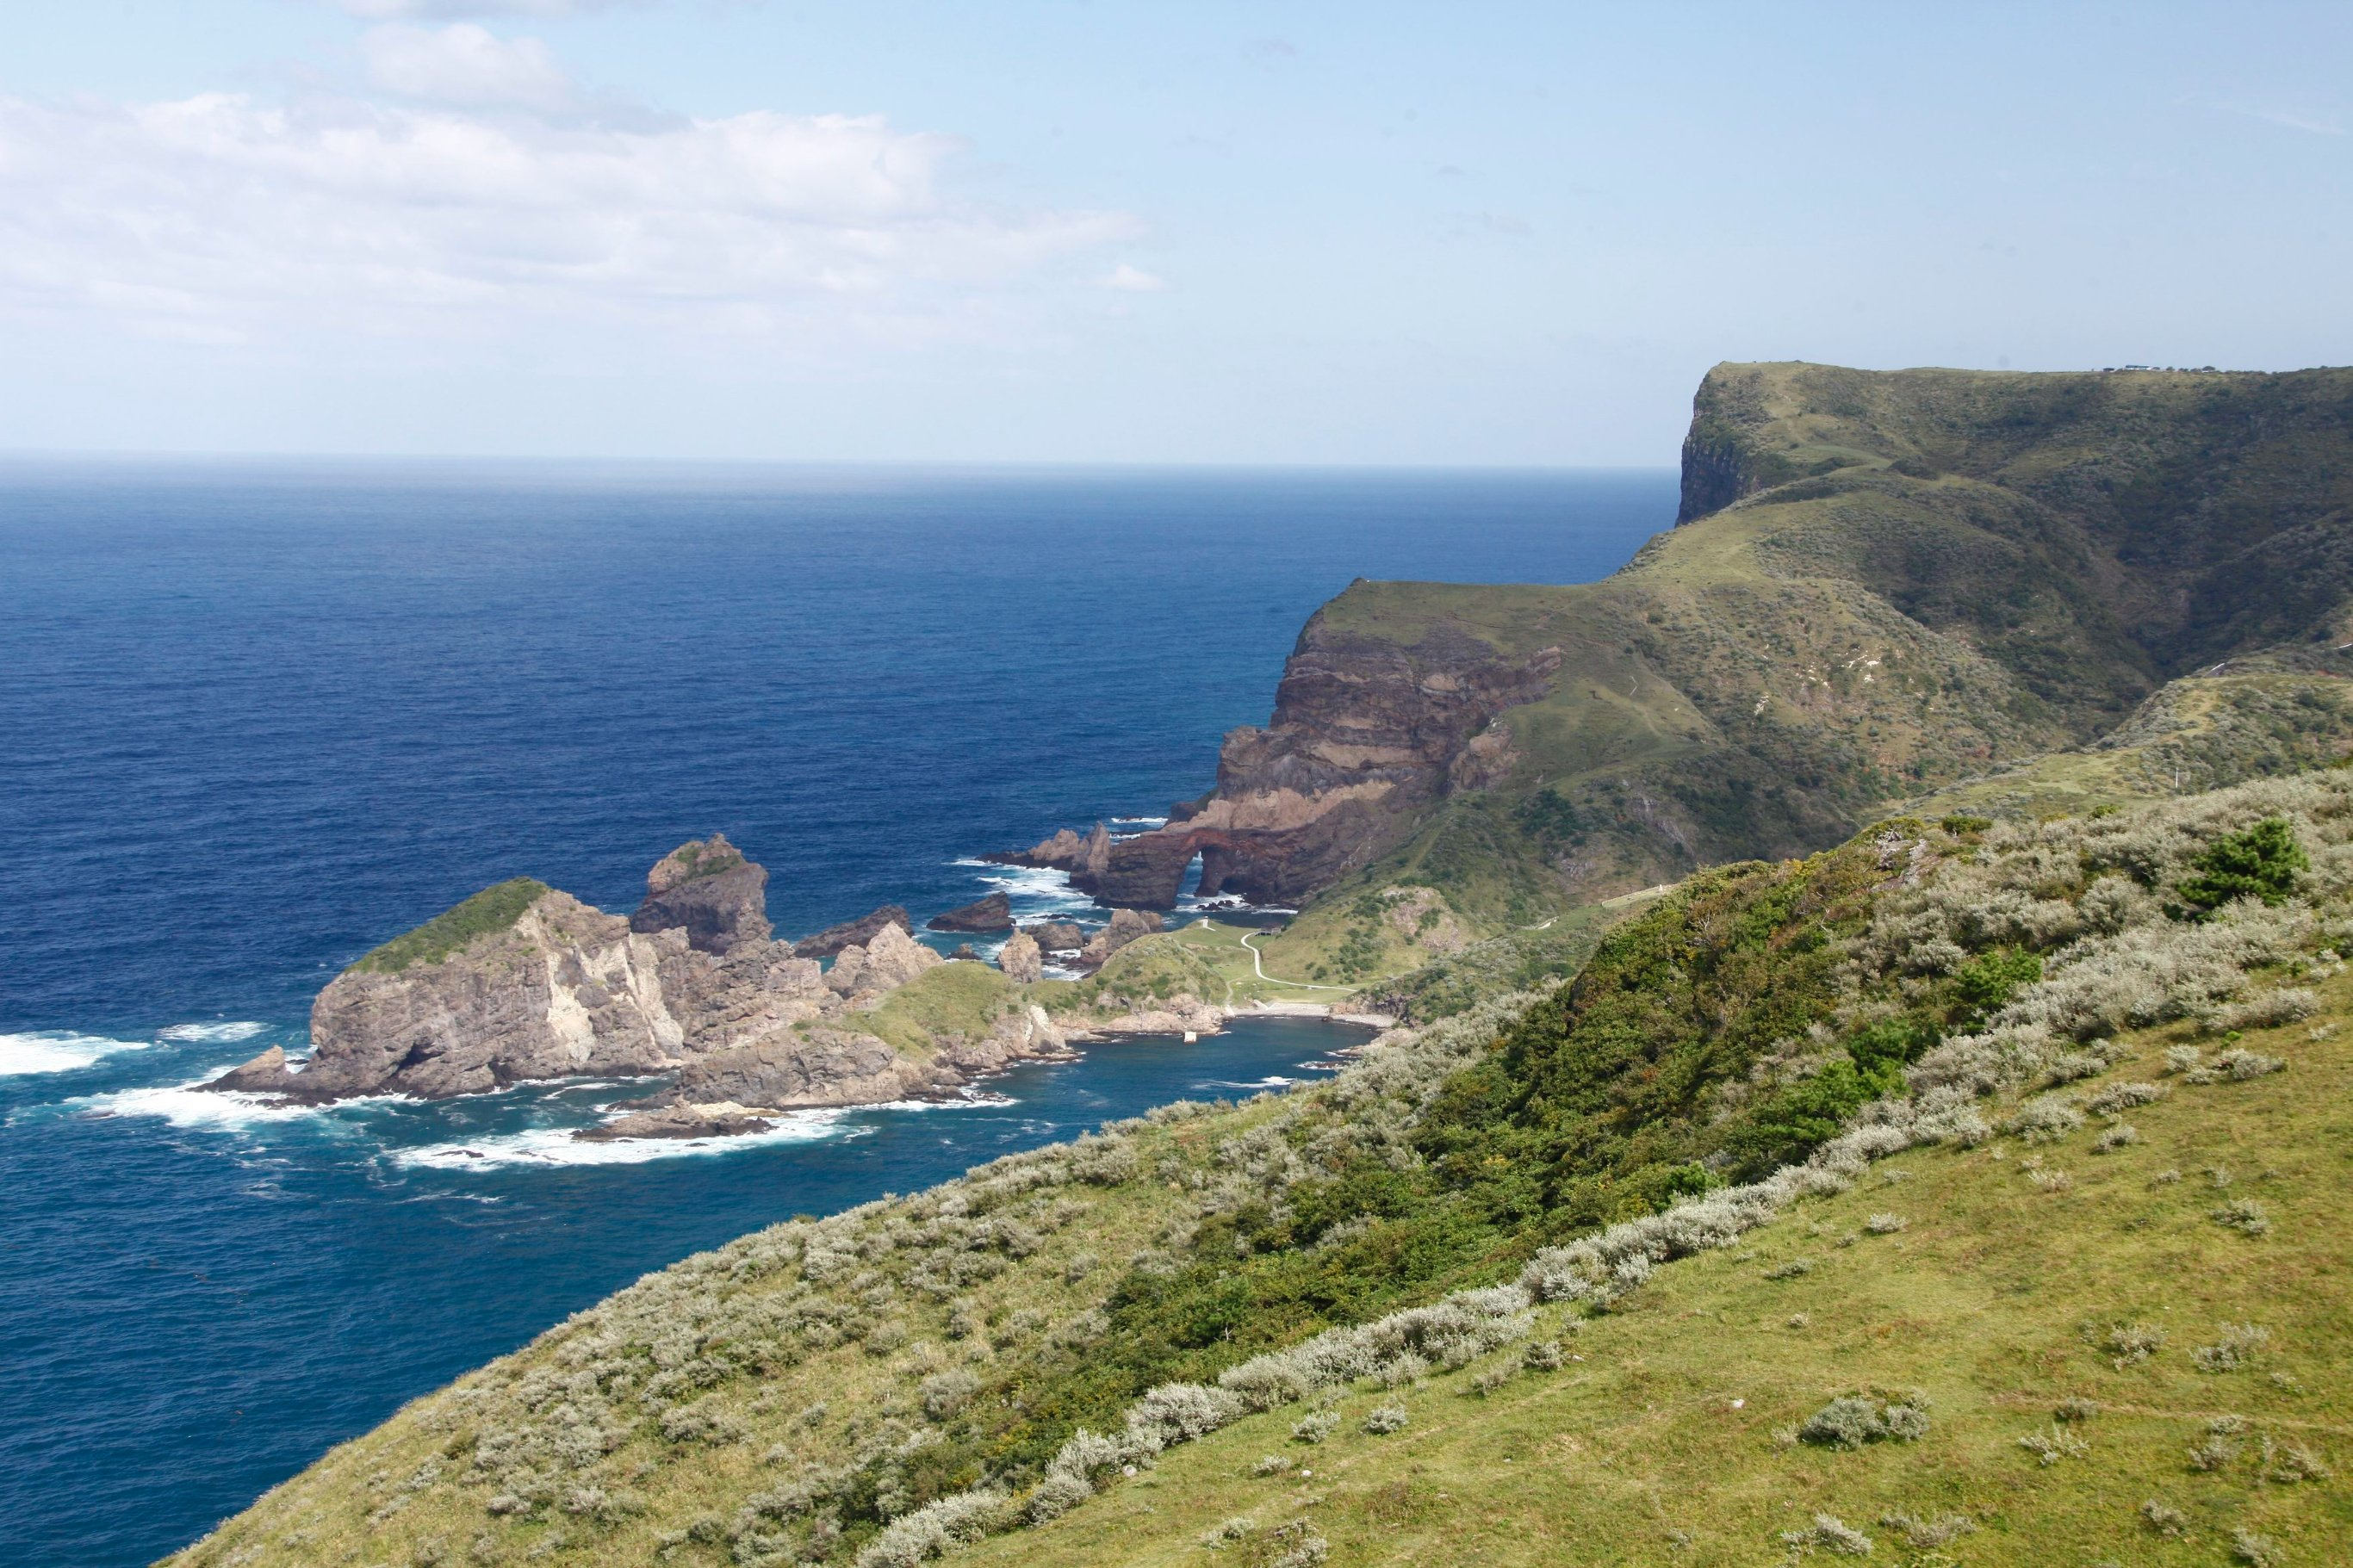 4-Day Explore the Oki Islands - Japan Itinerary